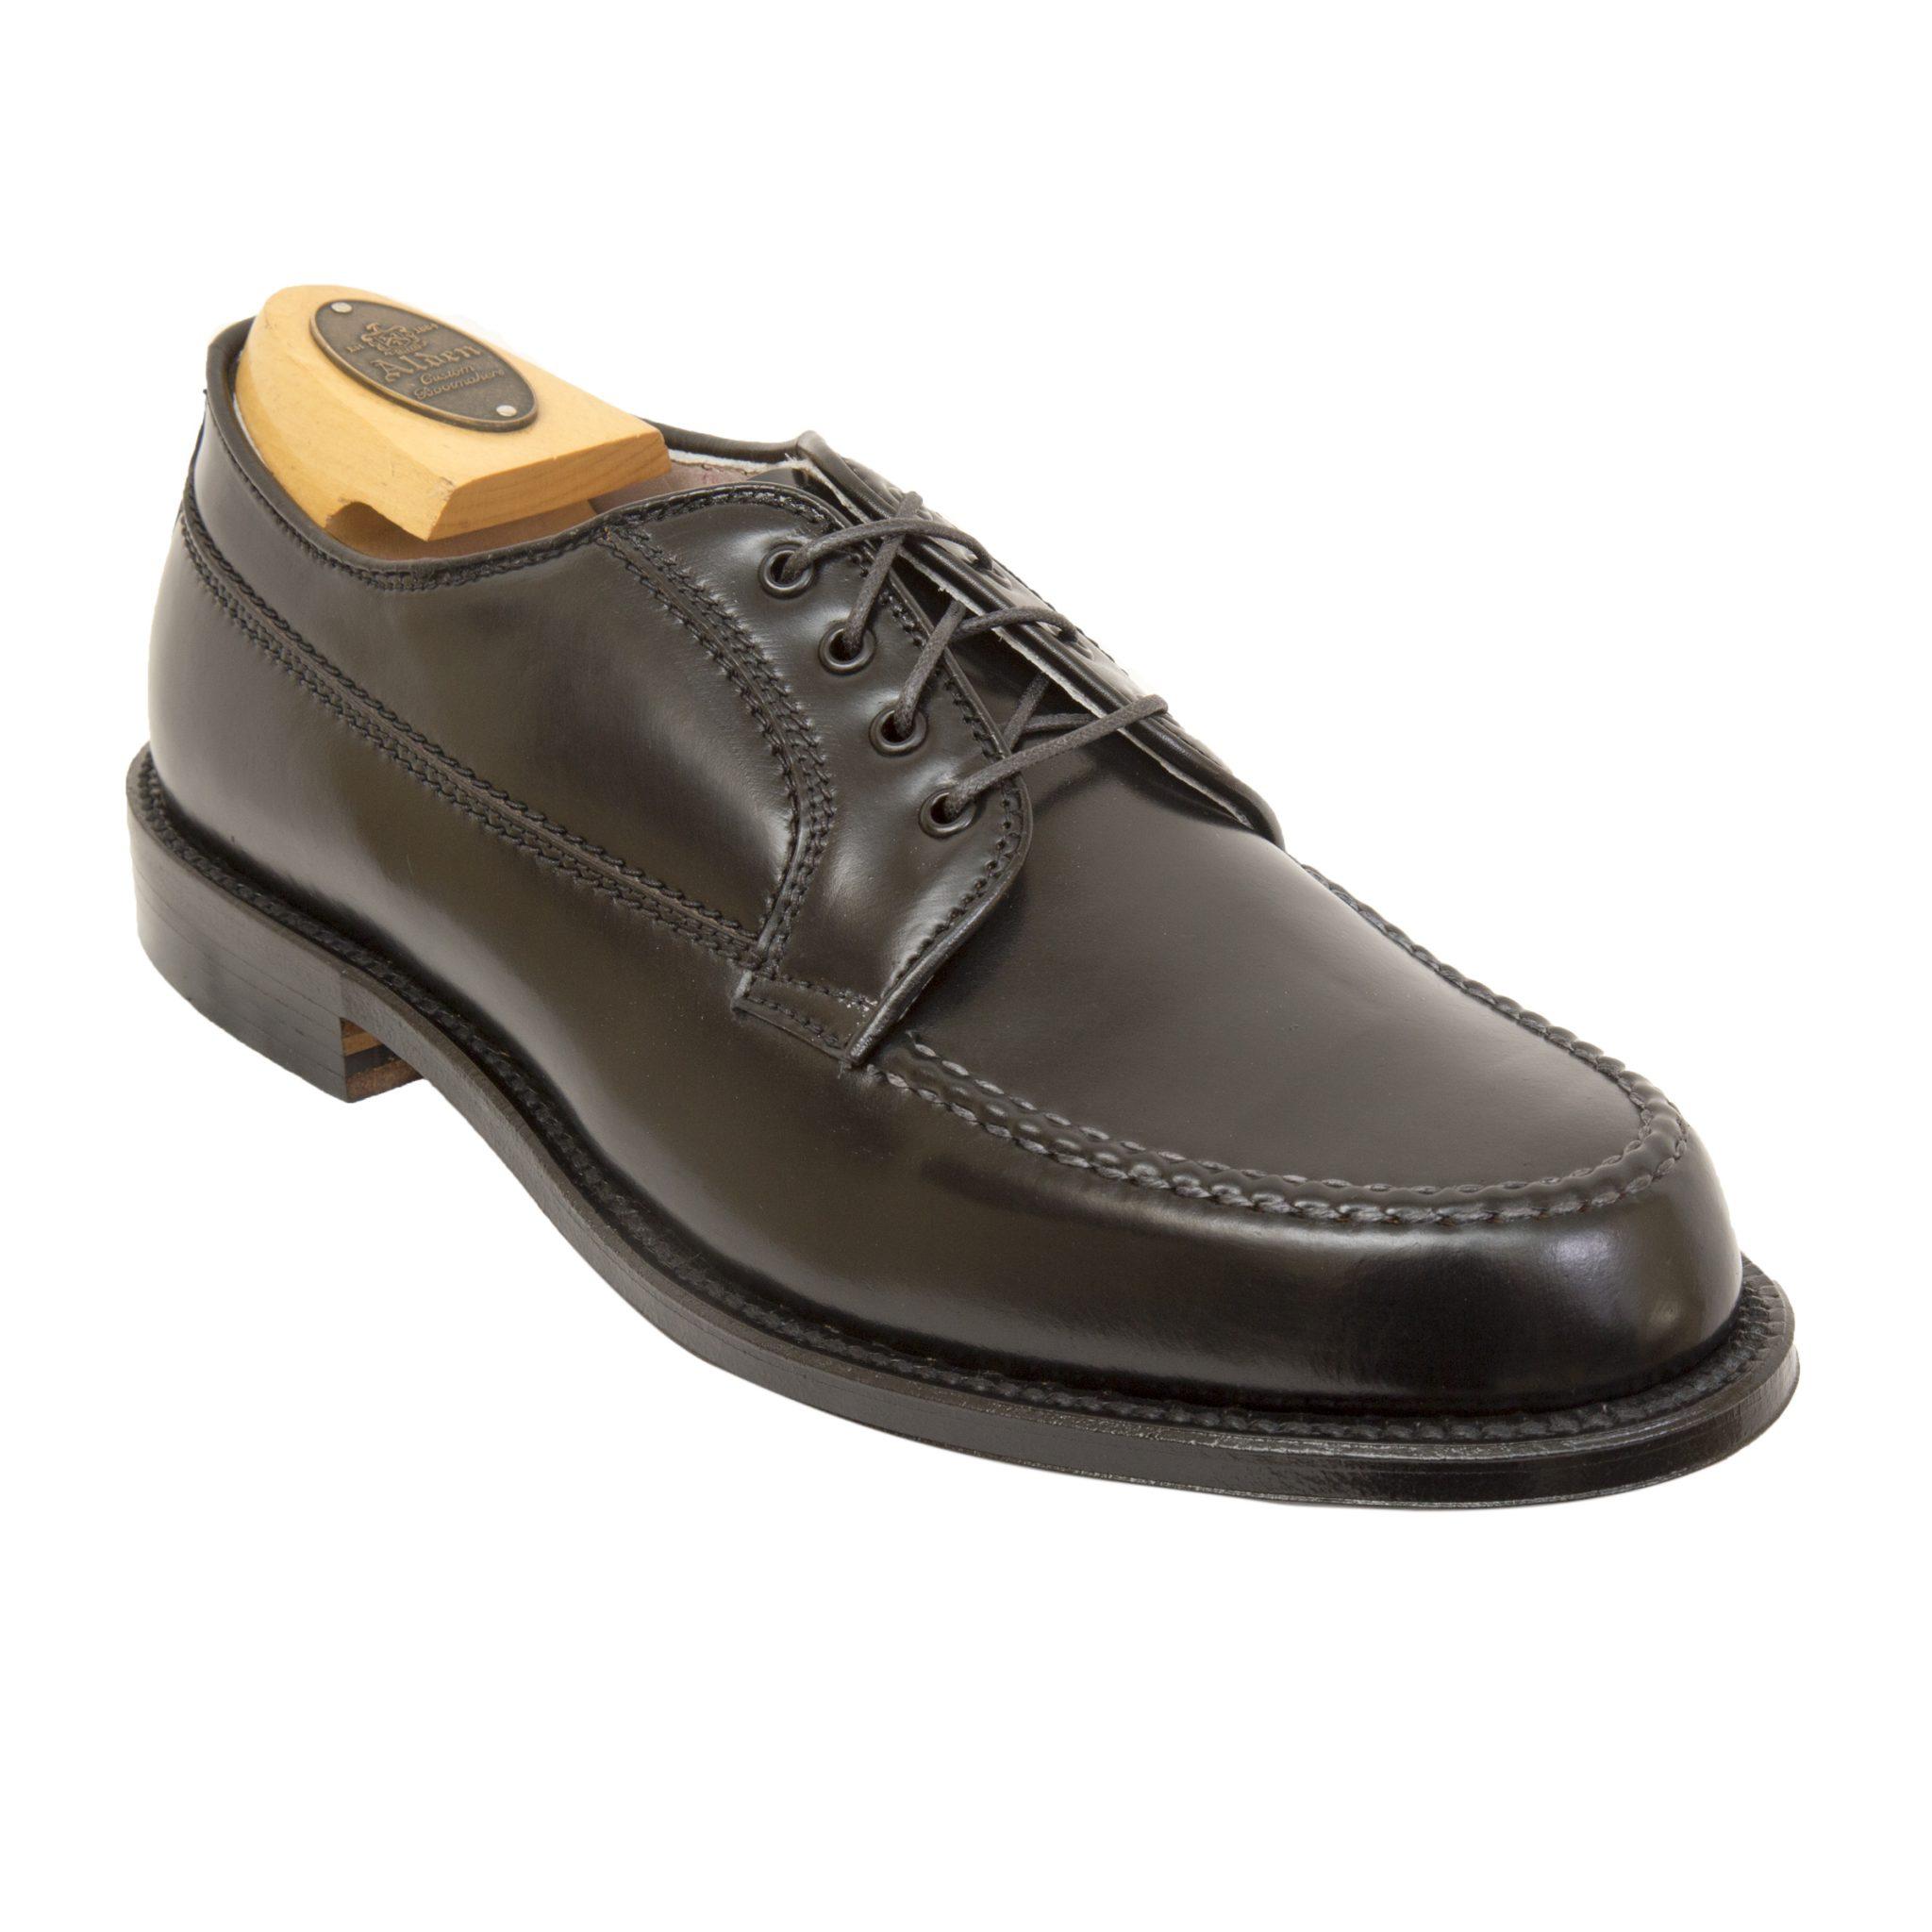 Alden Shoes New York Price